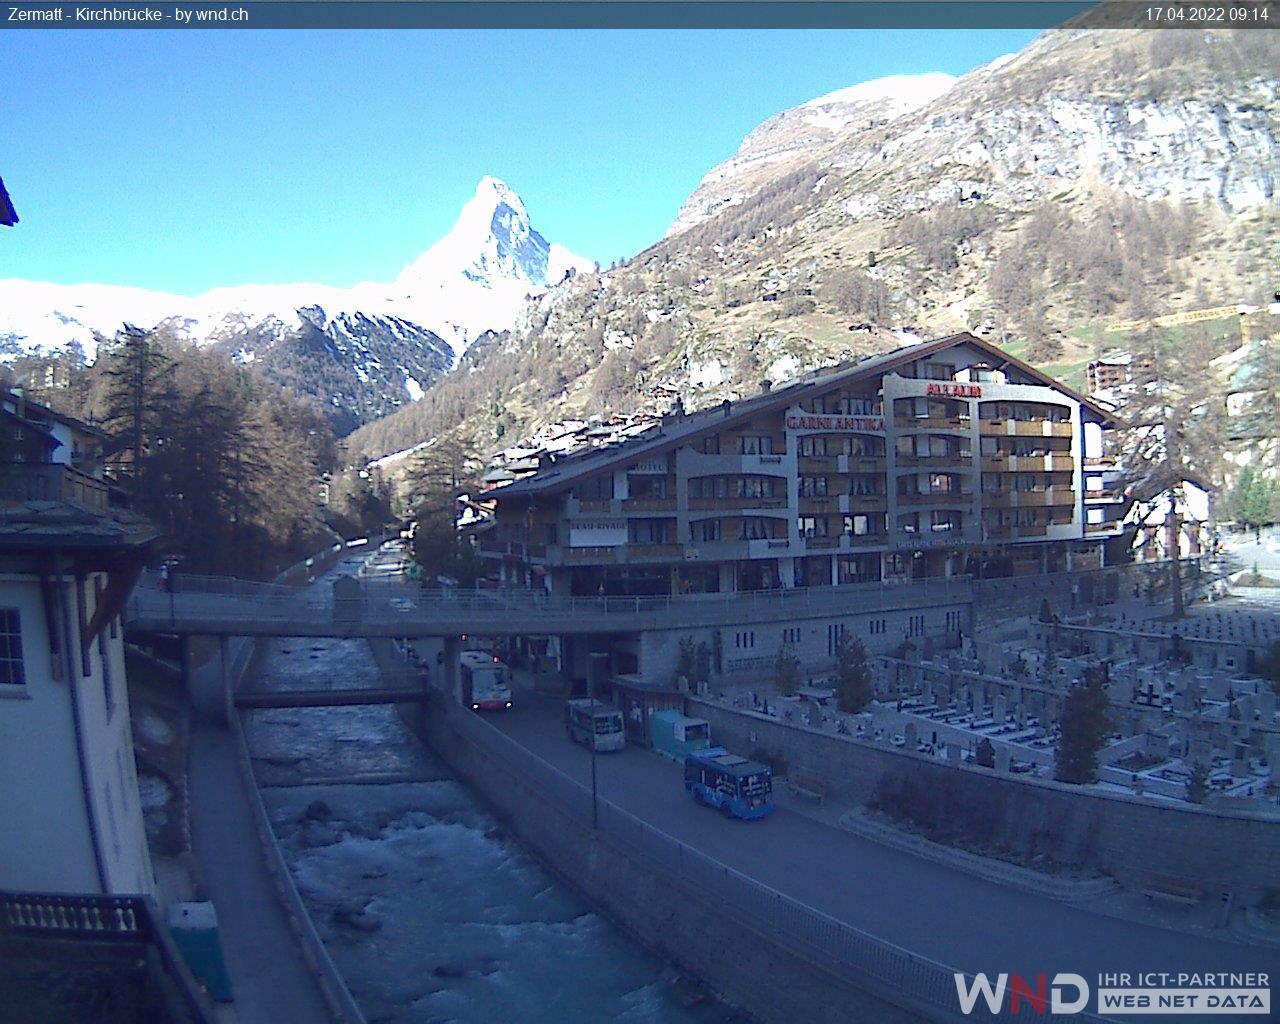 http://webcam.wnd.ch/kirchbruecke/ width=